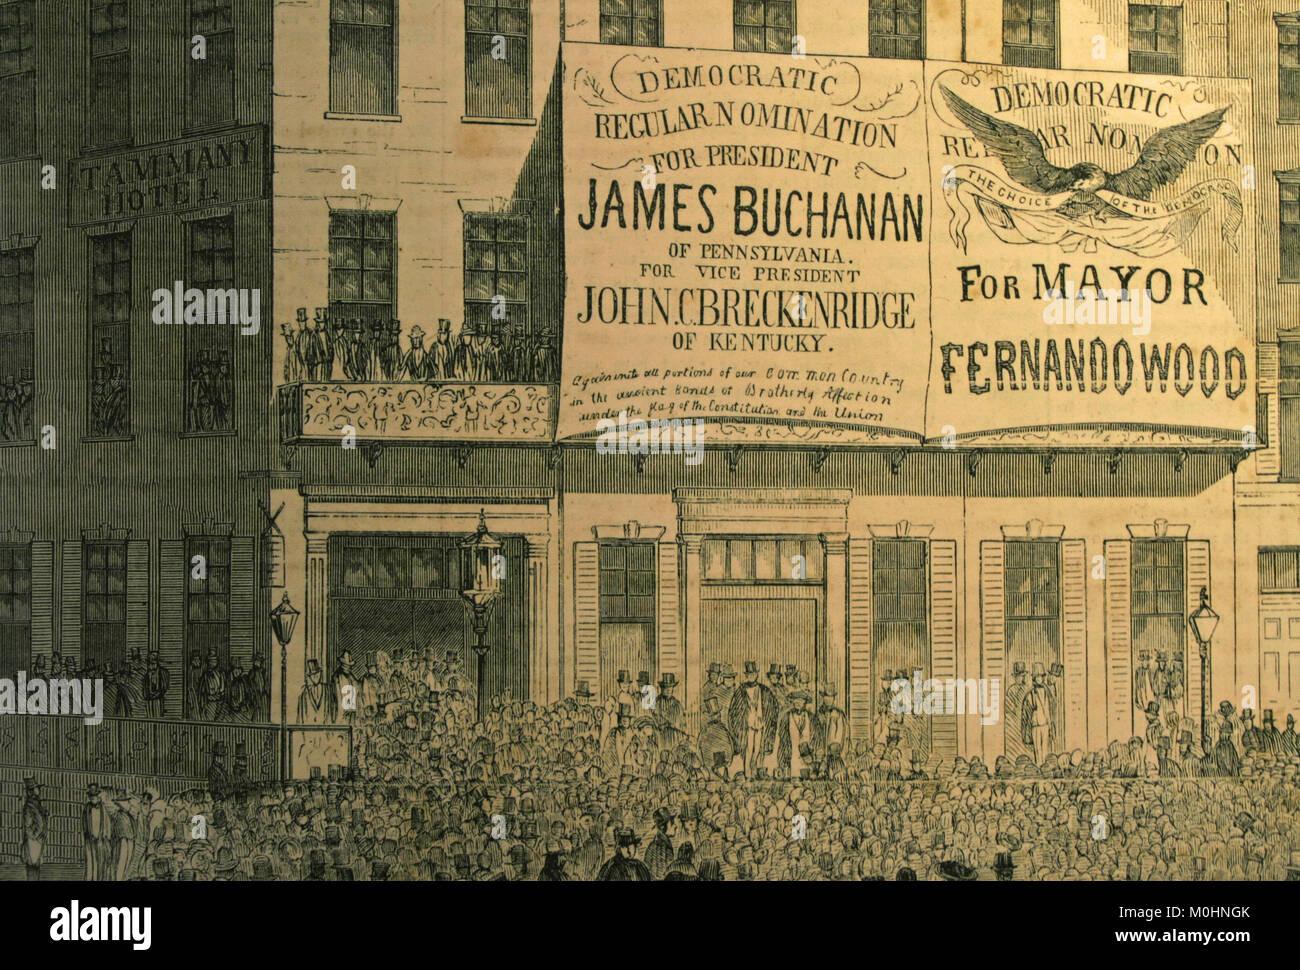 Drawn picture Democratic Regular Nominations for Mayors Fernando Wood, James Buchanan and John C. Breckenridge in - Stock Image